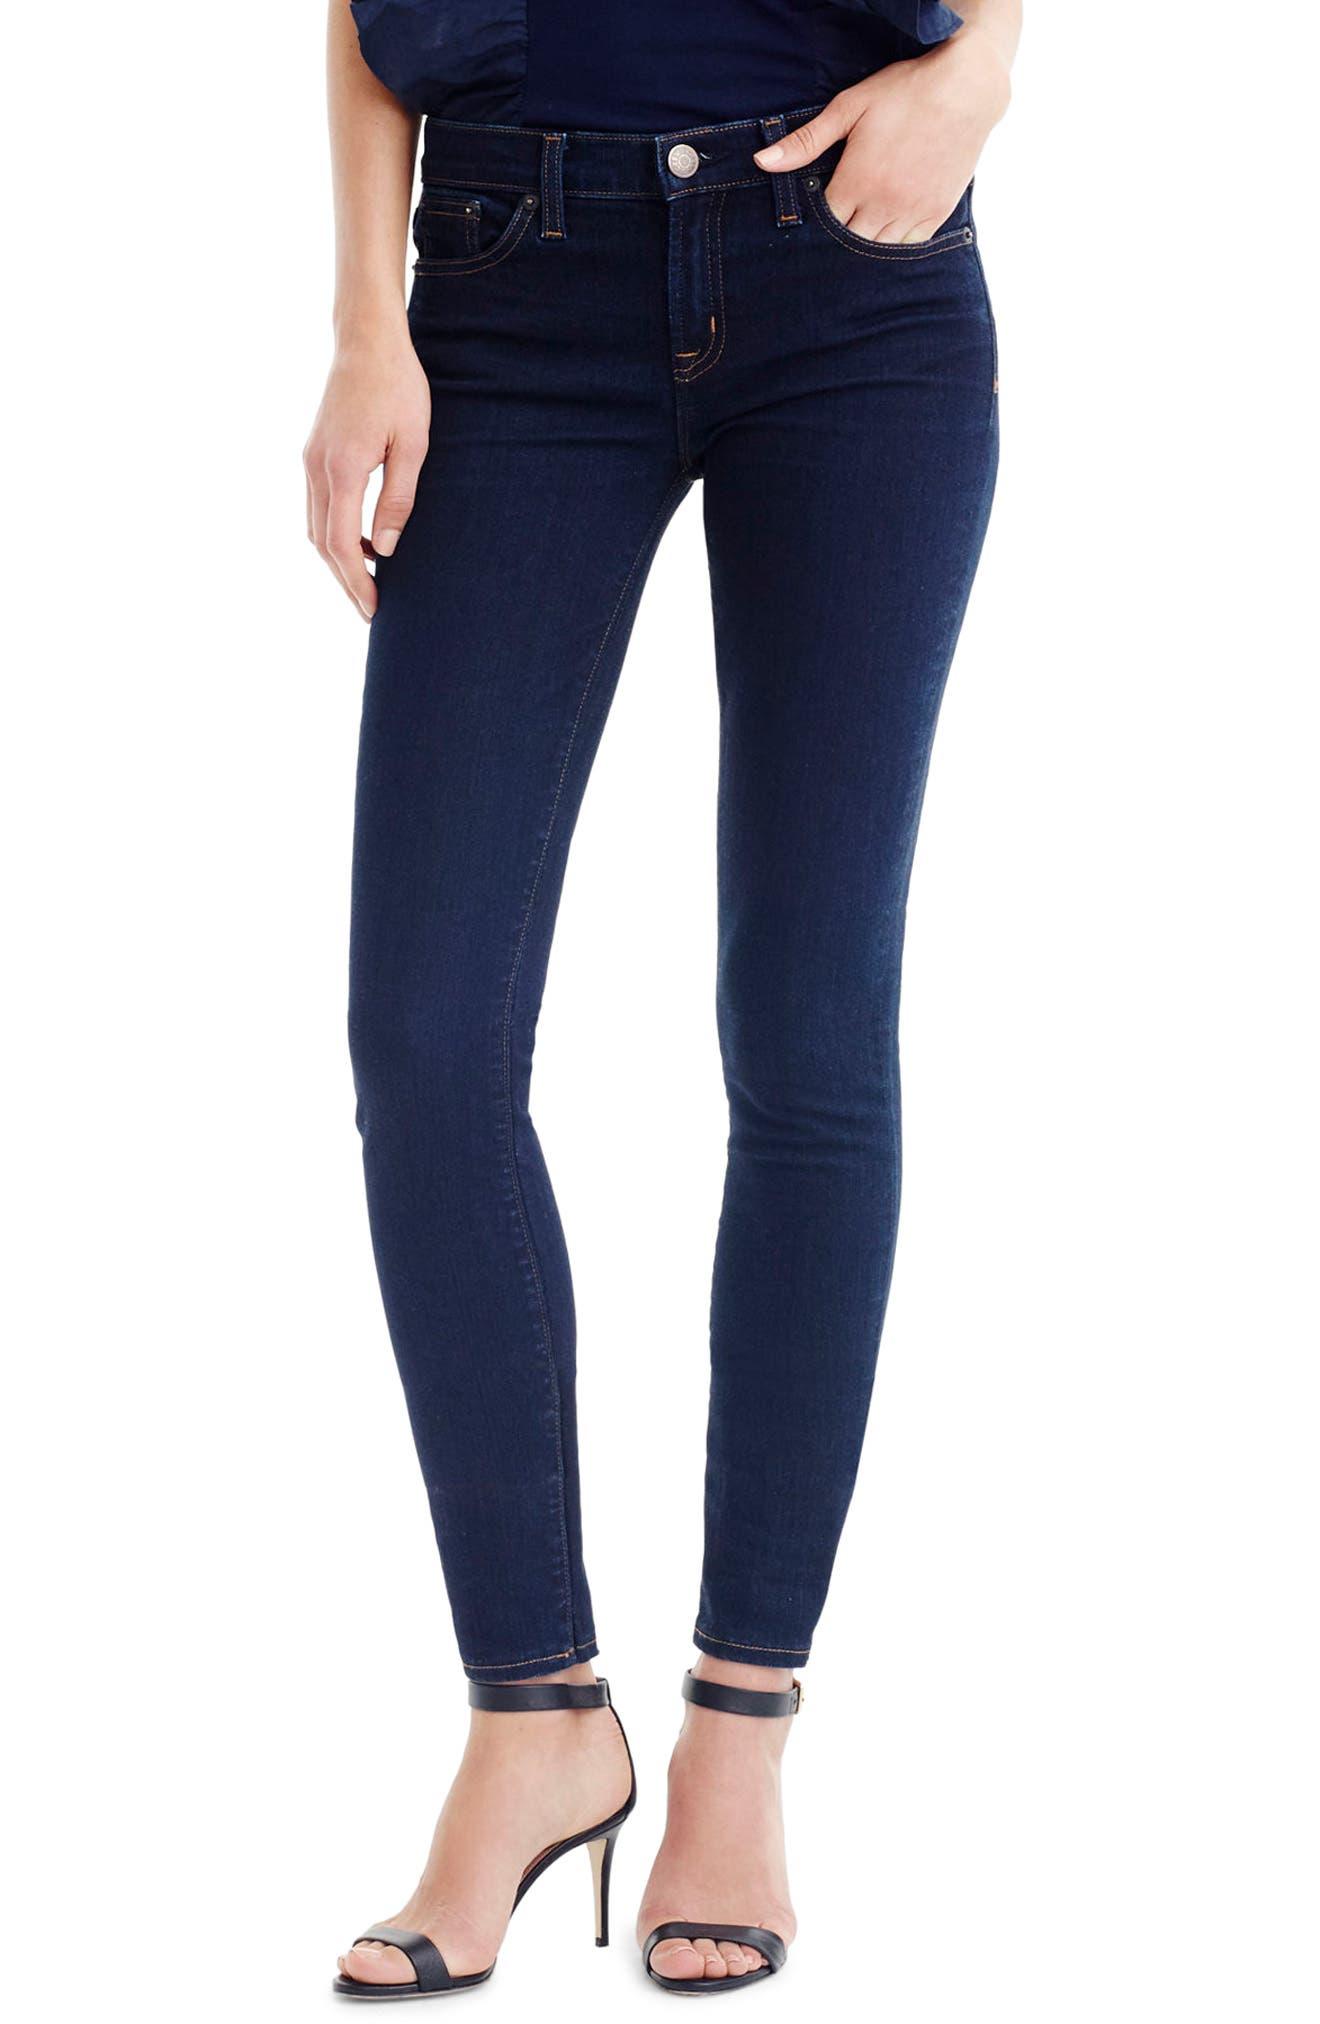 J.Crew Toothpick Jeans (Classic Rinse) (Regular & Petite)